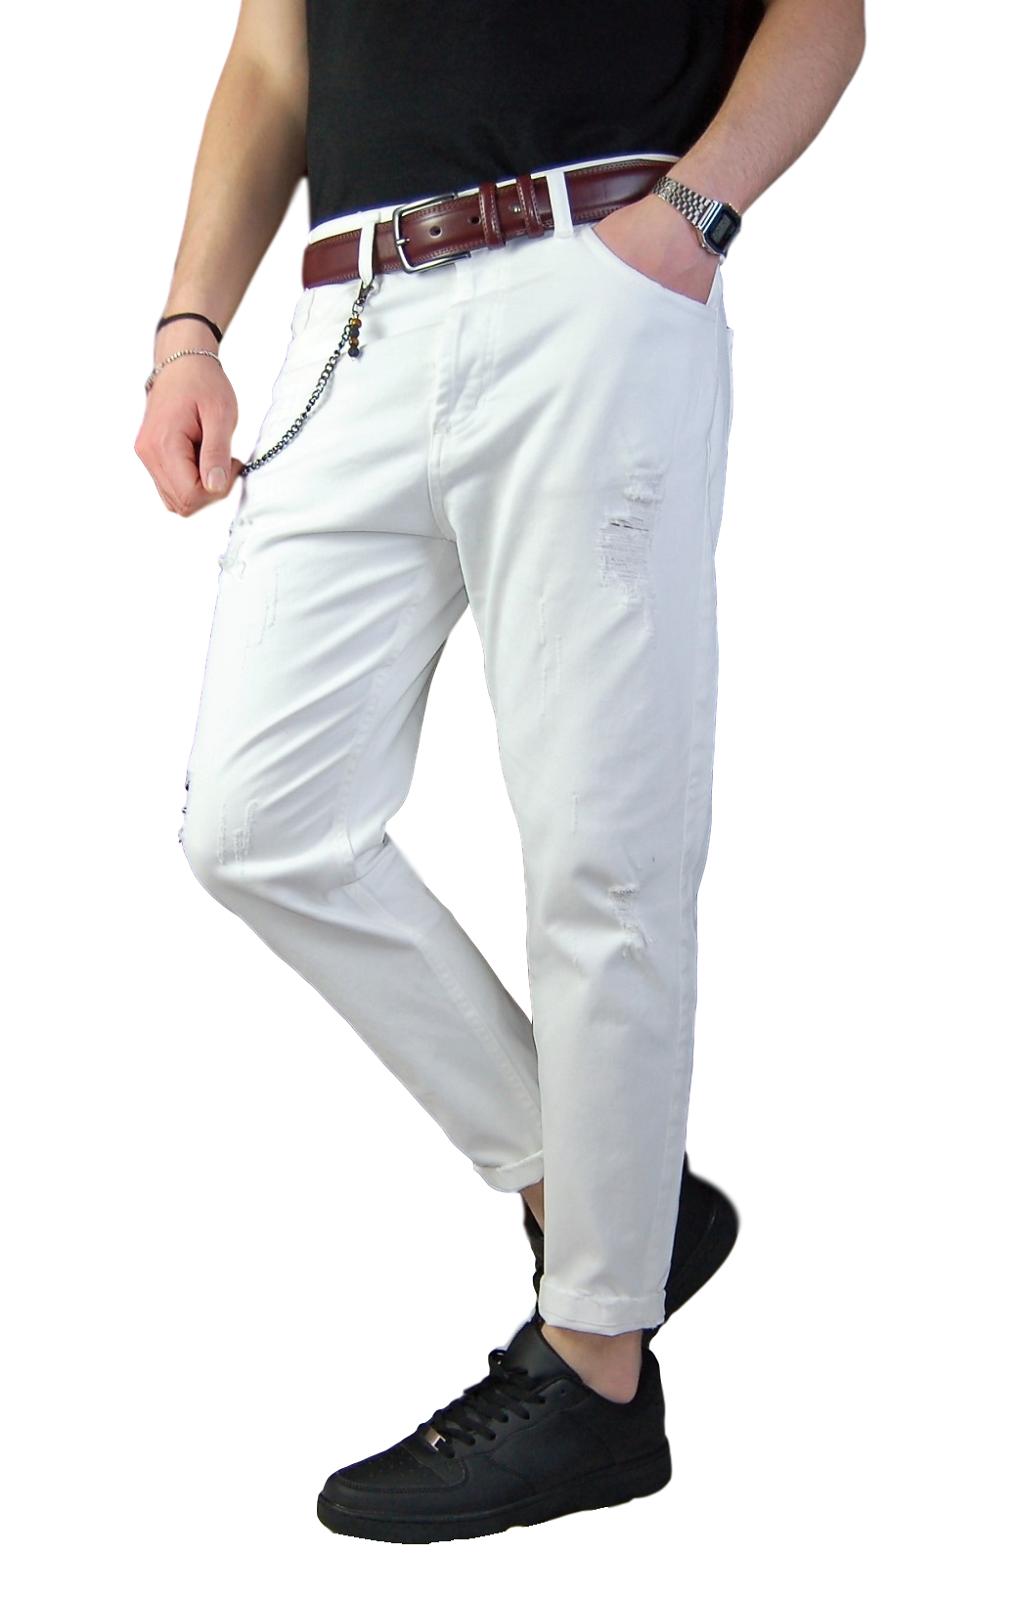 Pantalone-Uomo-Strappato-Slim-fit-Primaverile-Pantaloni-Jeans-Strappati miniatura 8